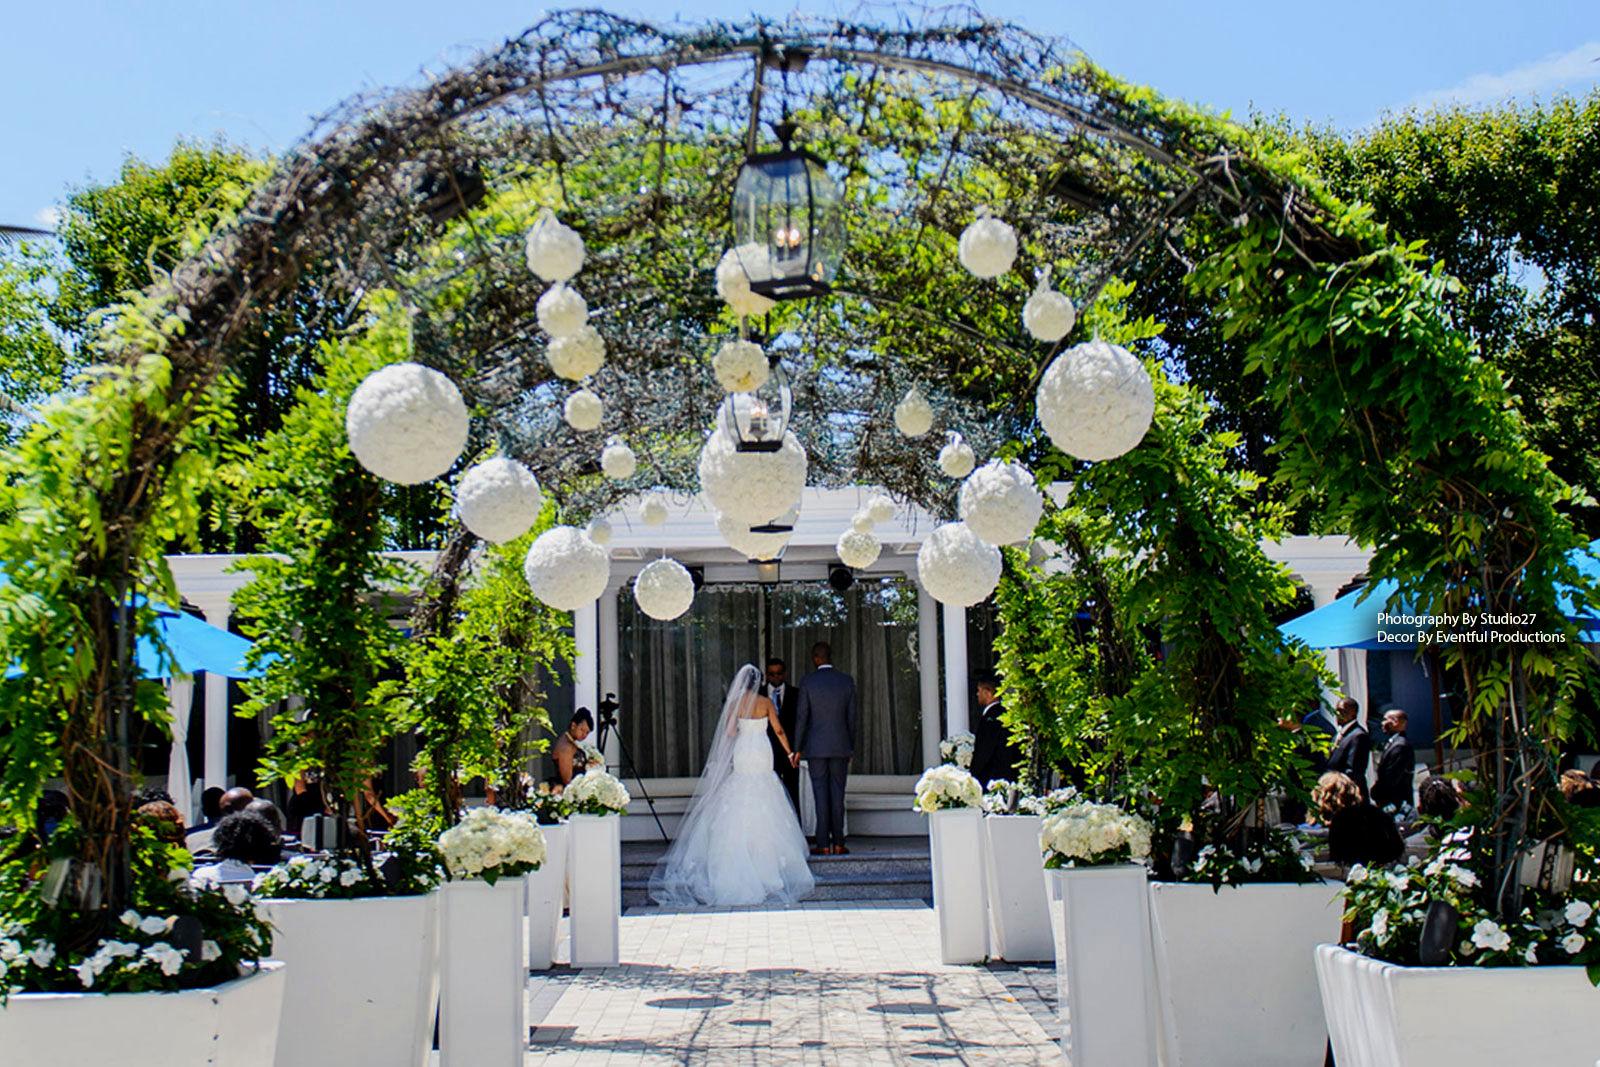 weddings outside.jpg